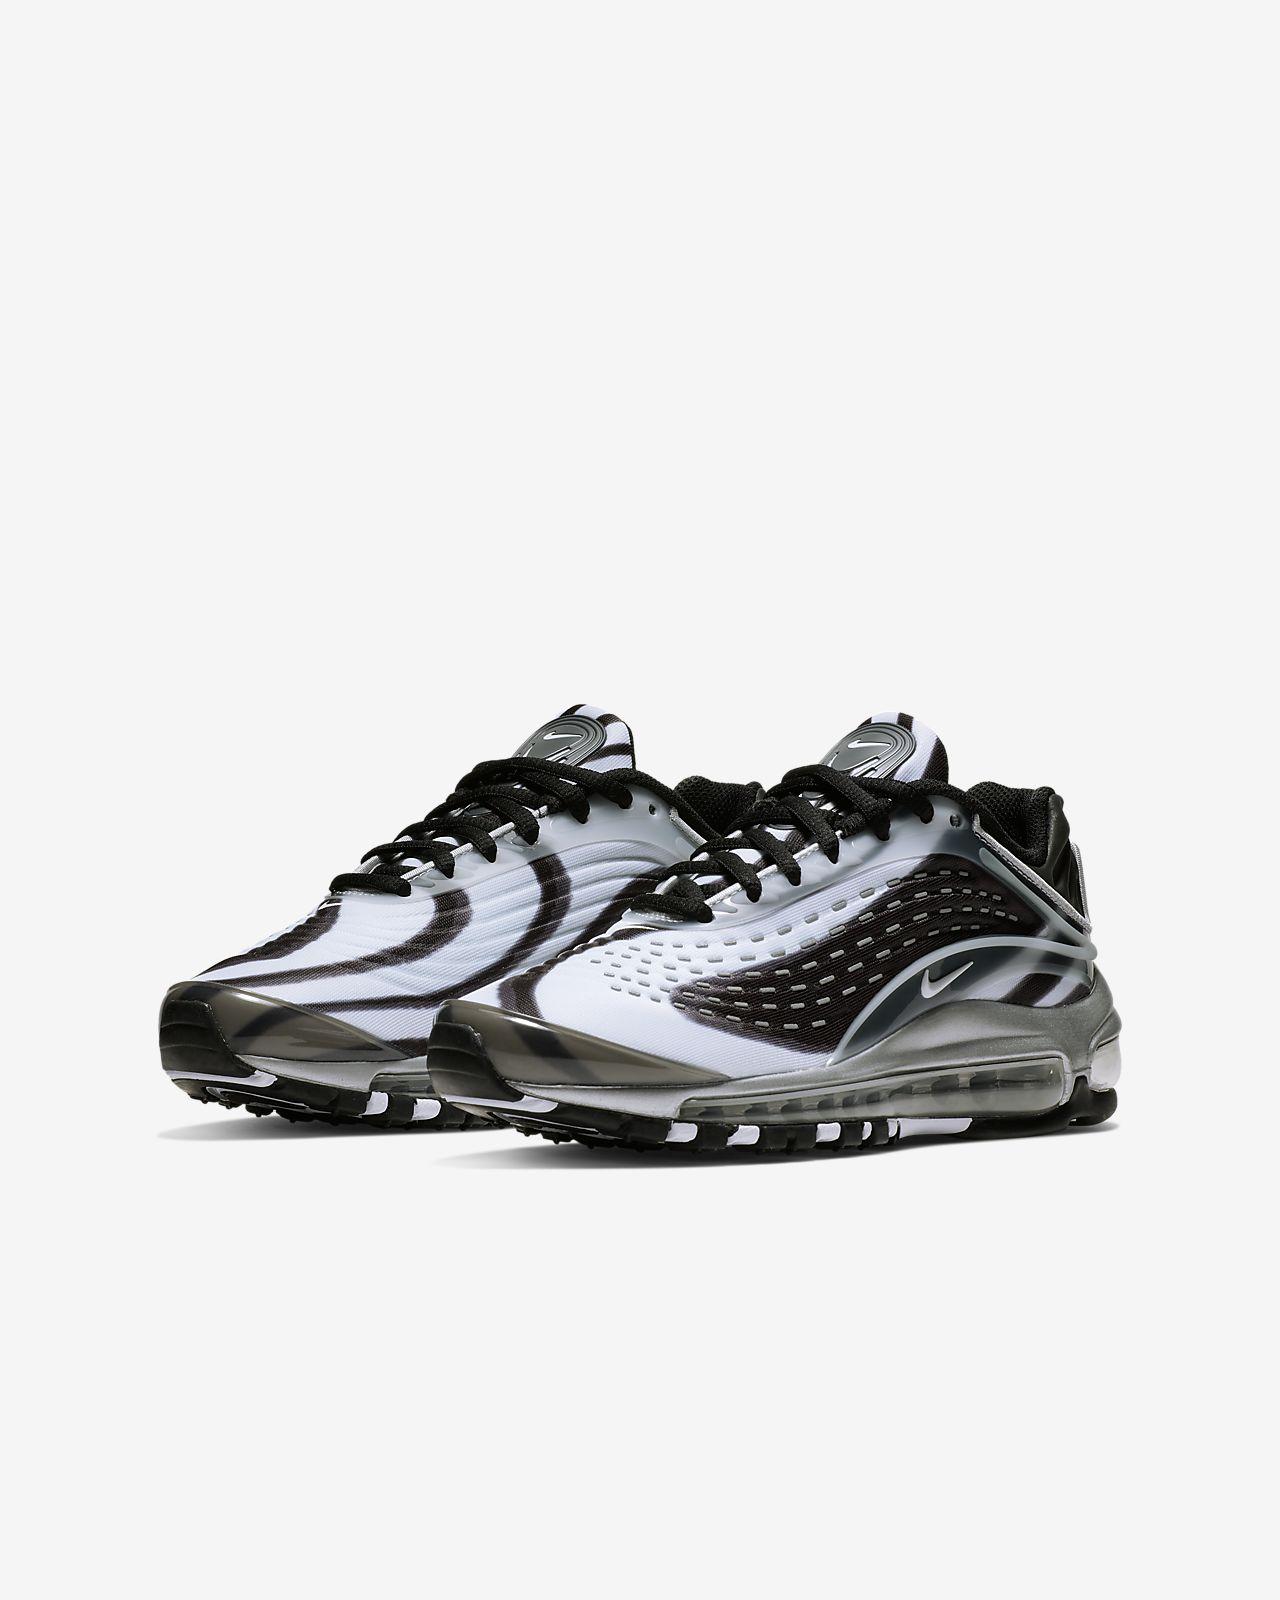 san francisco 5ea16 f6162 ... Nike Air Max Deluxe Big Kids  Shoe